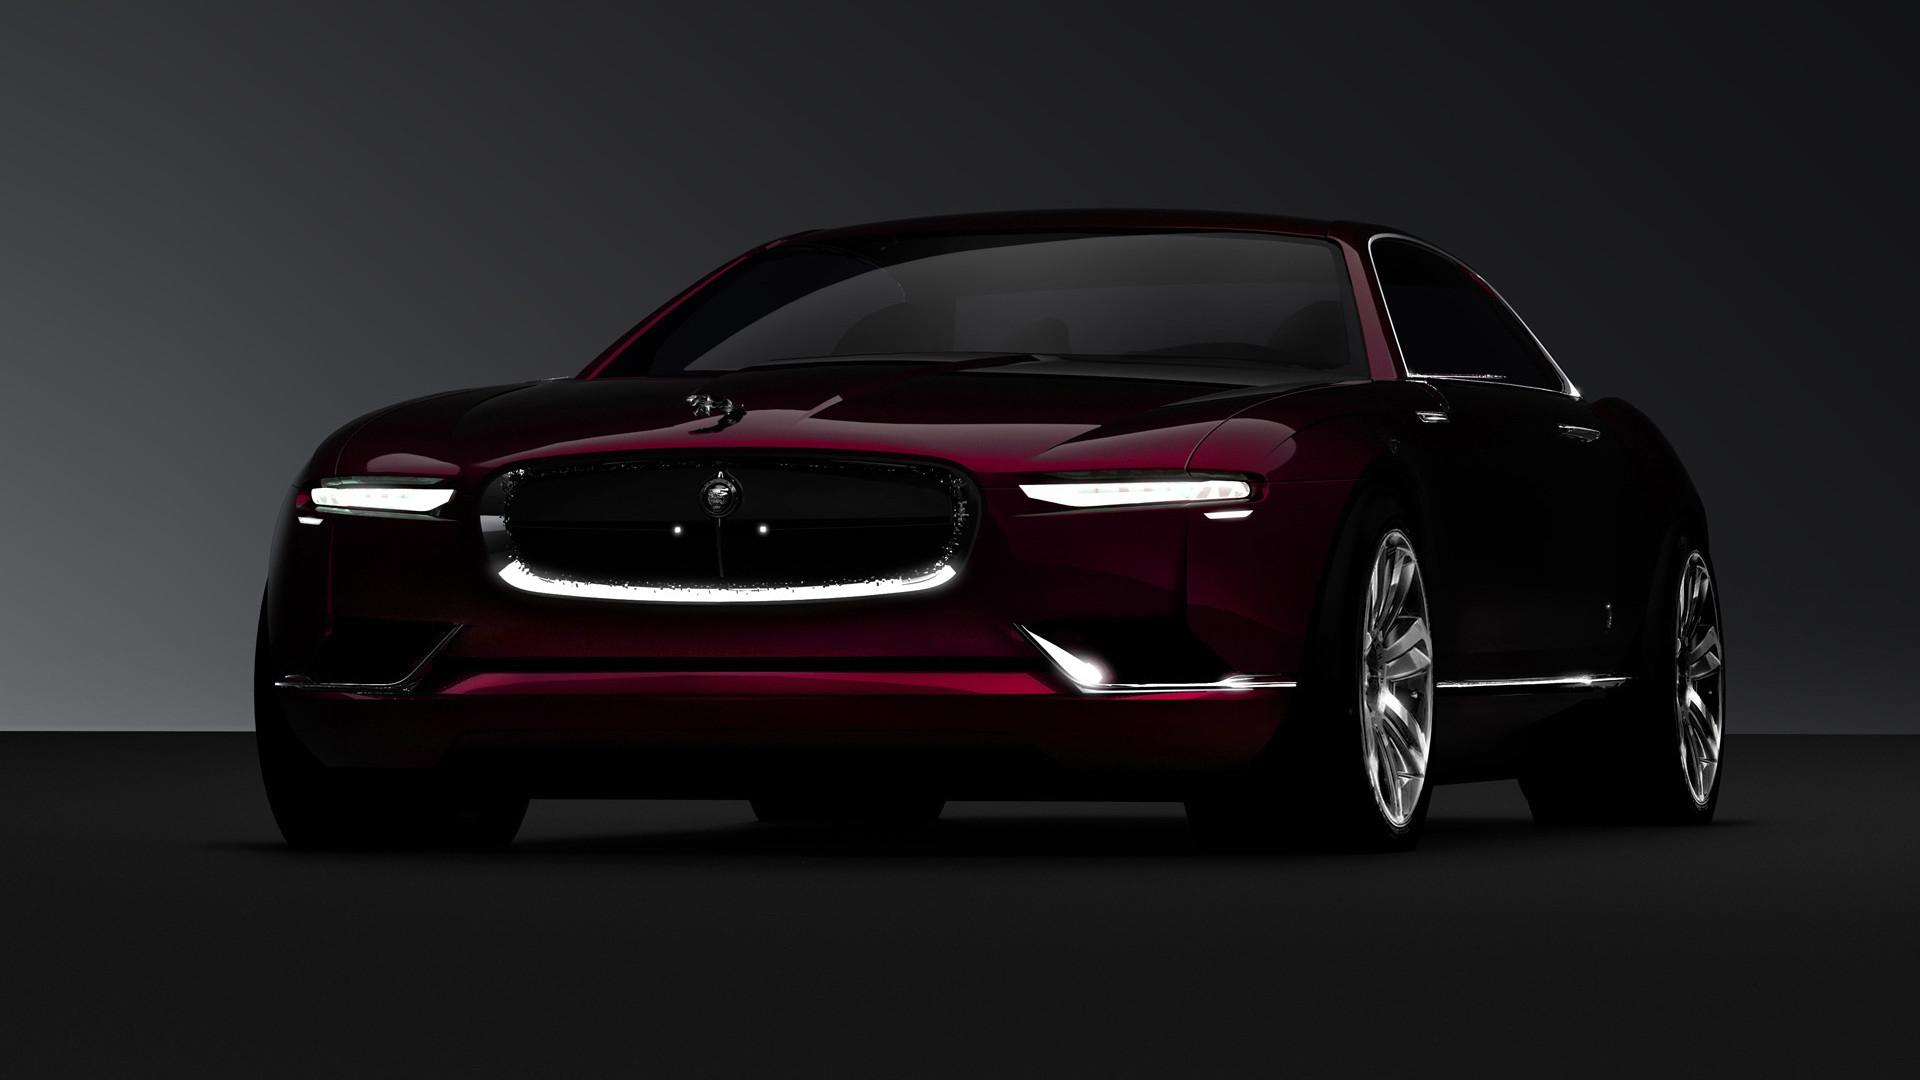 Latest Jaguar Car Hd Images At IMG Z5i And Jaguar Car Hd Newest On Wall